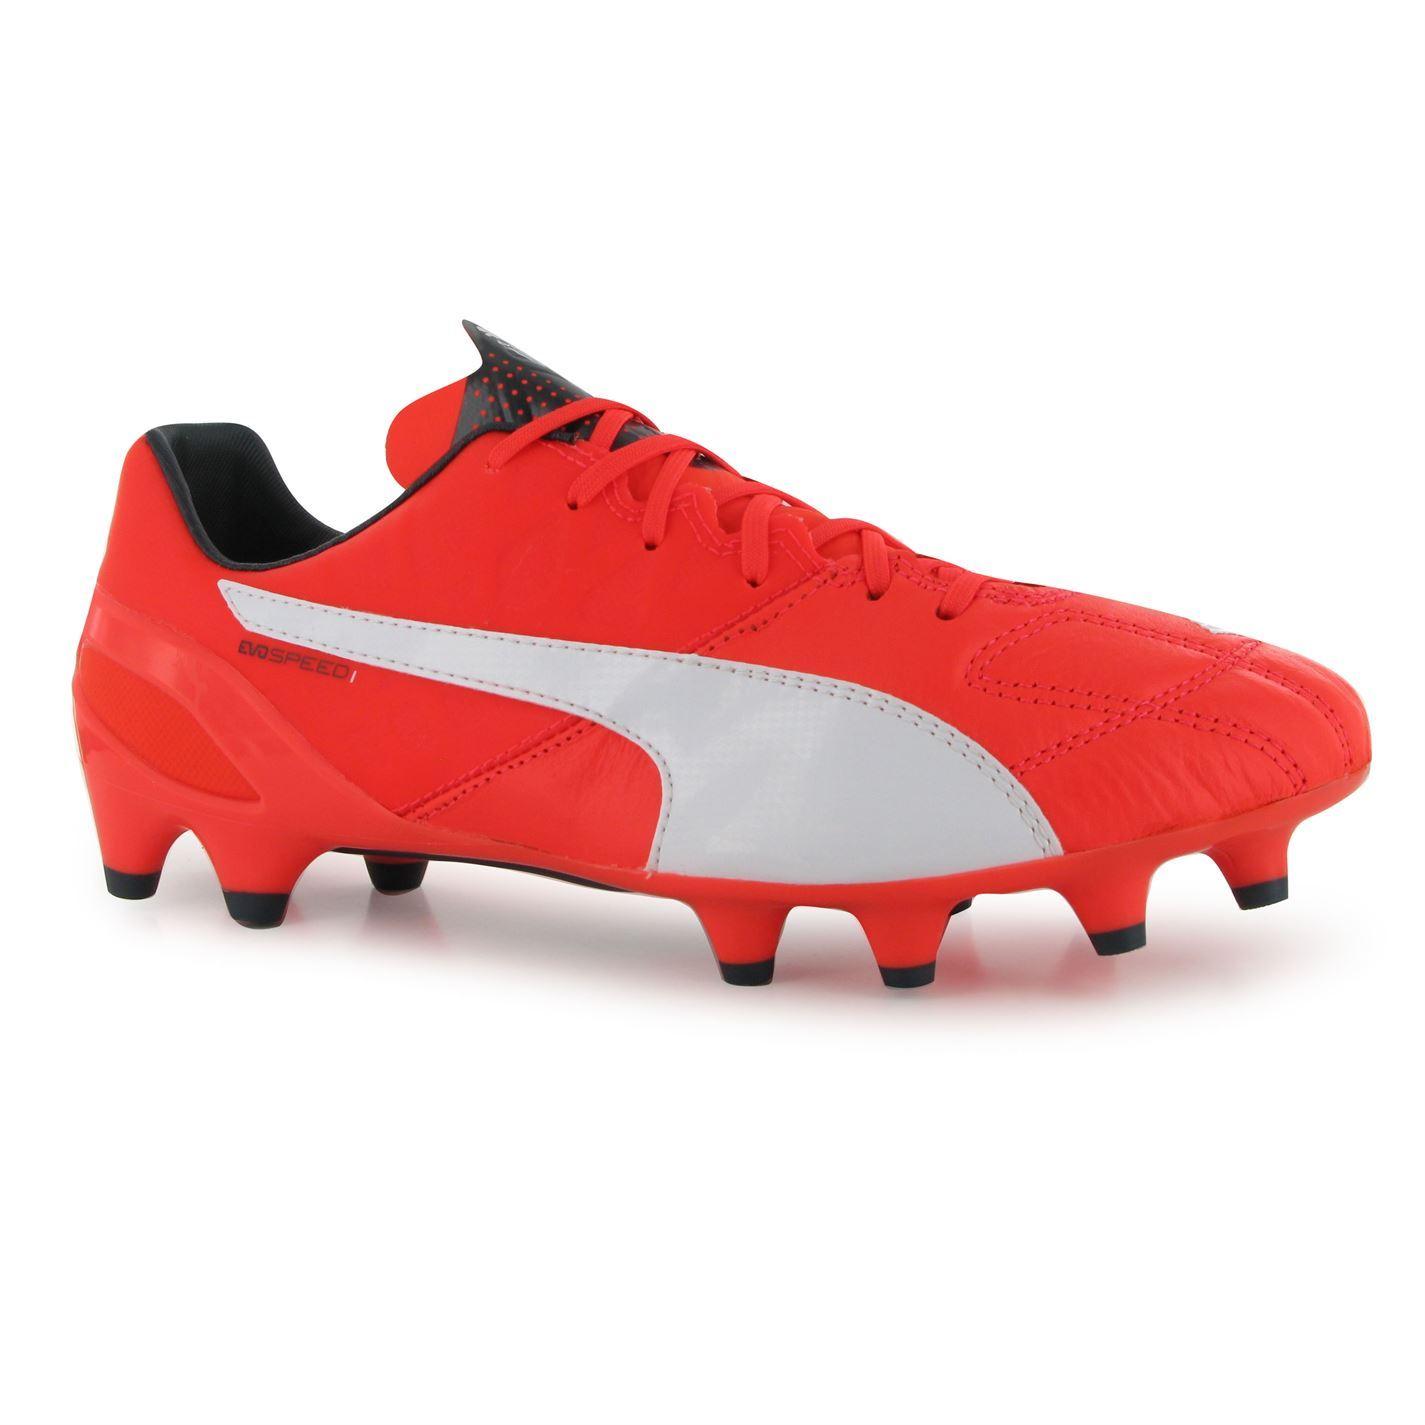 ... Puma evoSpeed 1 Leather FG Firm Ground Football Boots Mens Lava Soccer  Cleats ... fe32e72ce